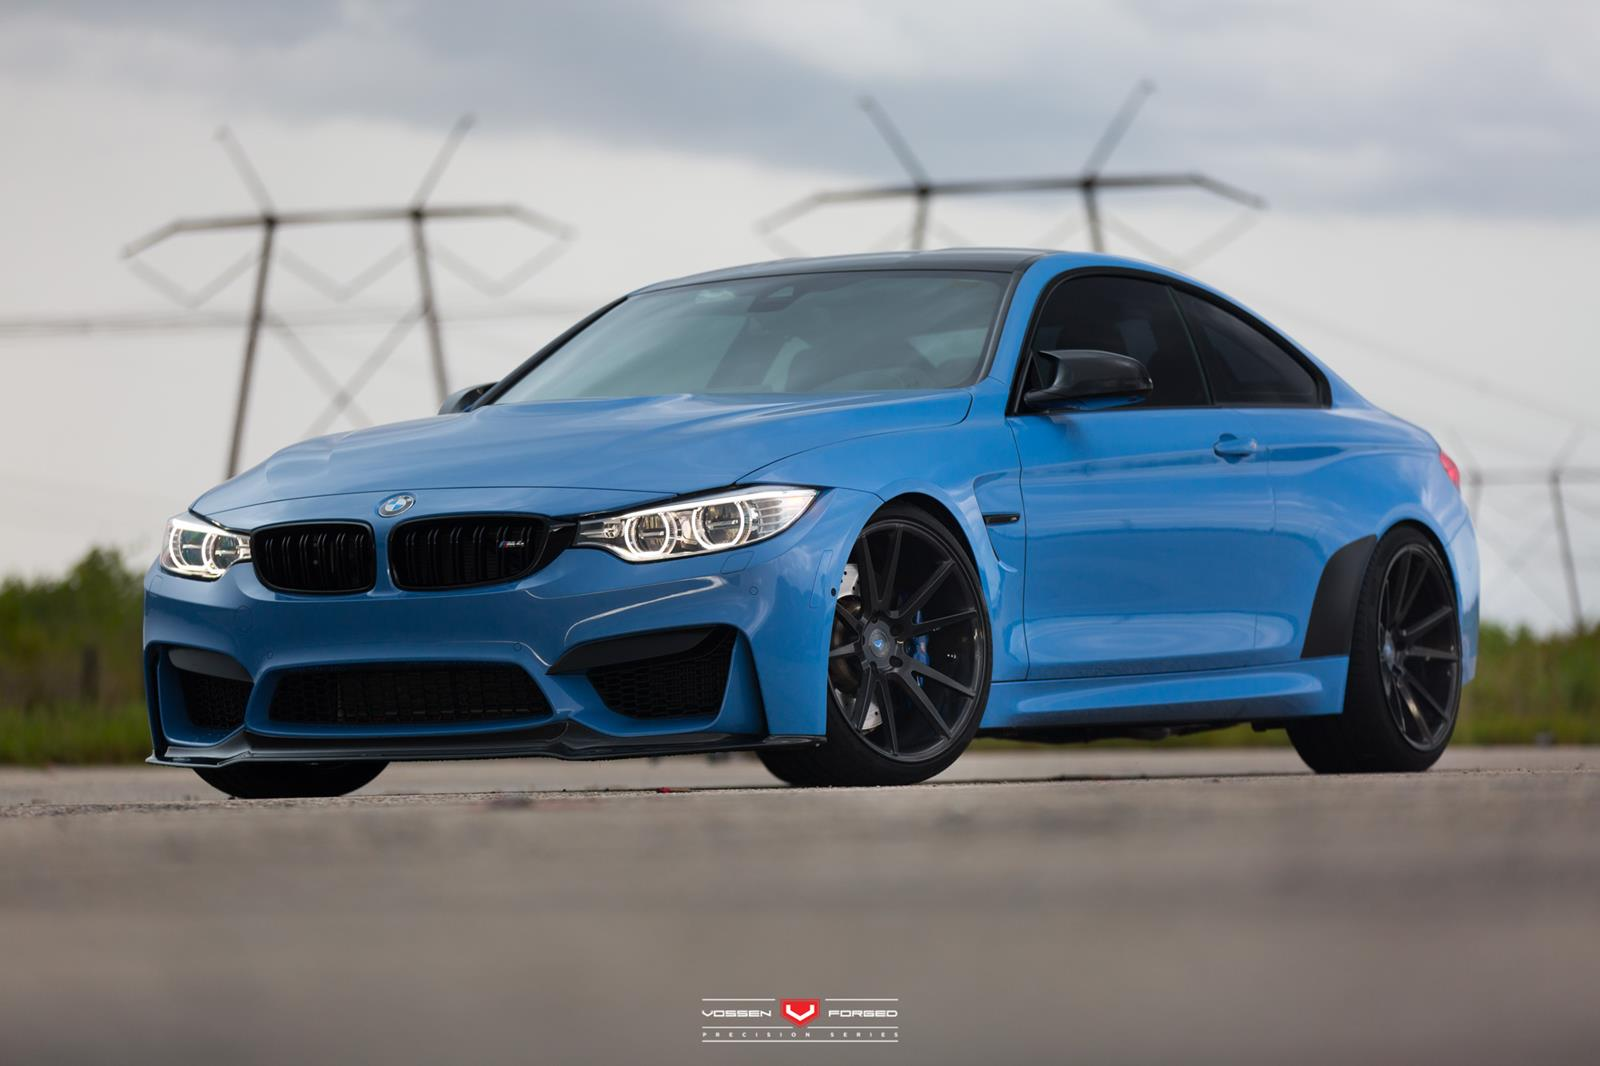 BMW M4 VOSSEN FORGED PRECISION SERIES VPS 301